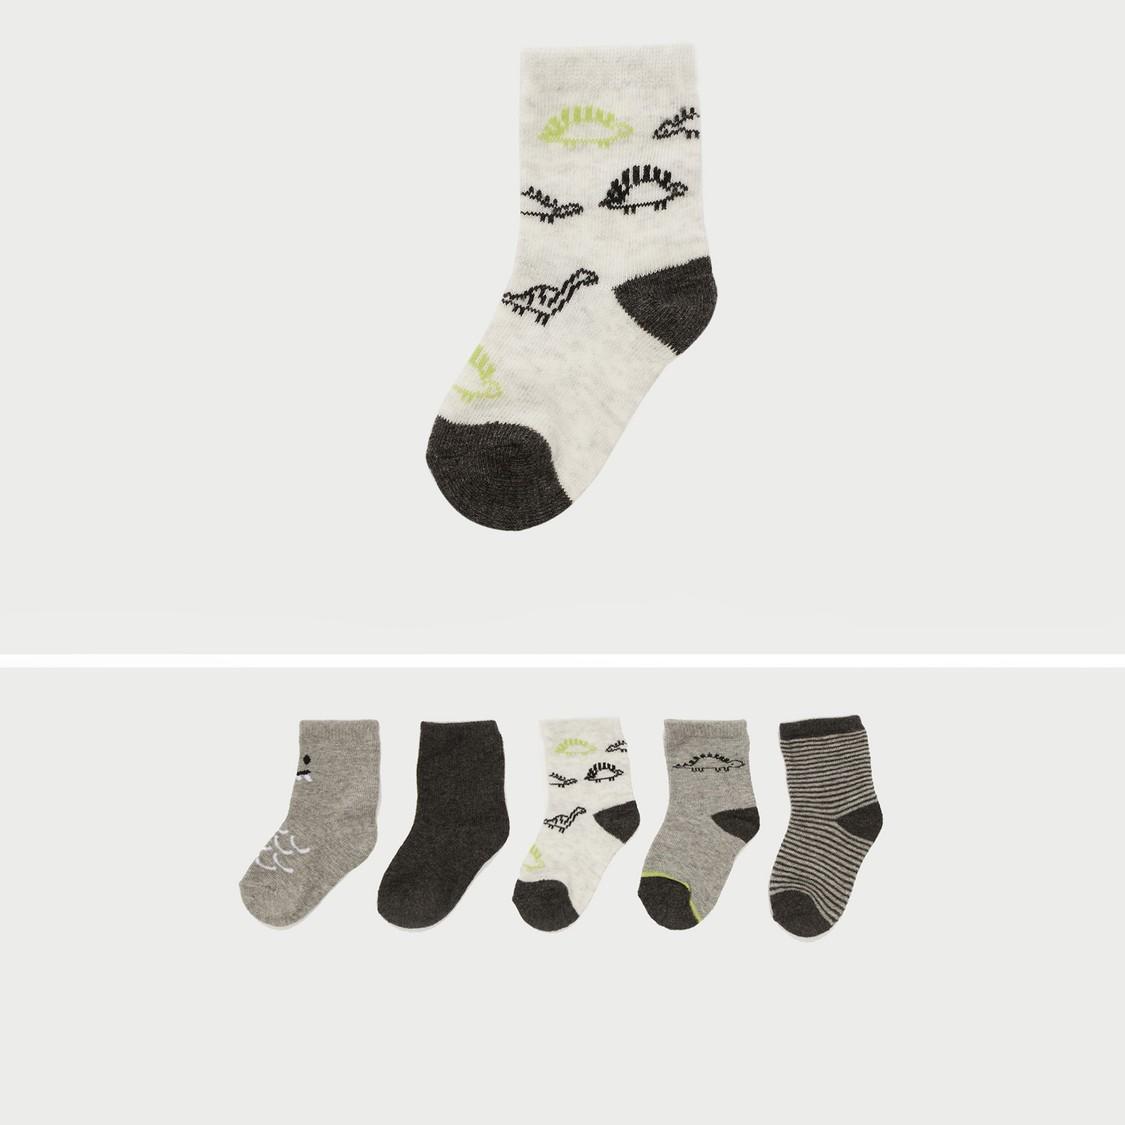 Pack of 5 - Printed Ankle Length Socks with Elasticised Hem